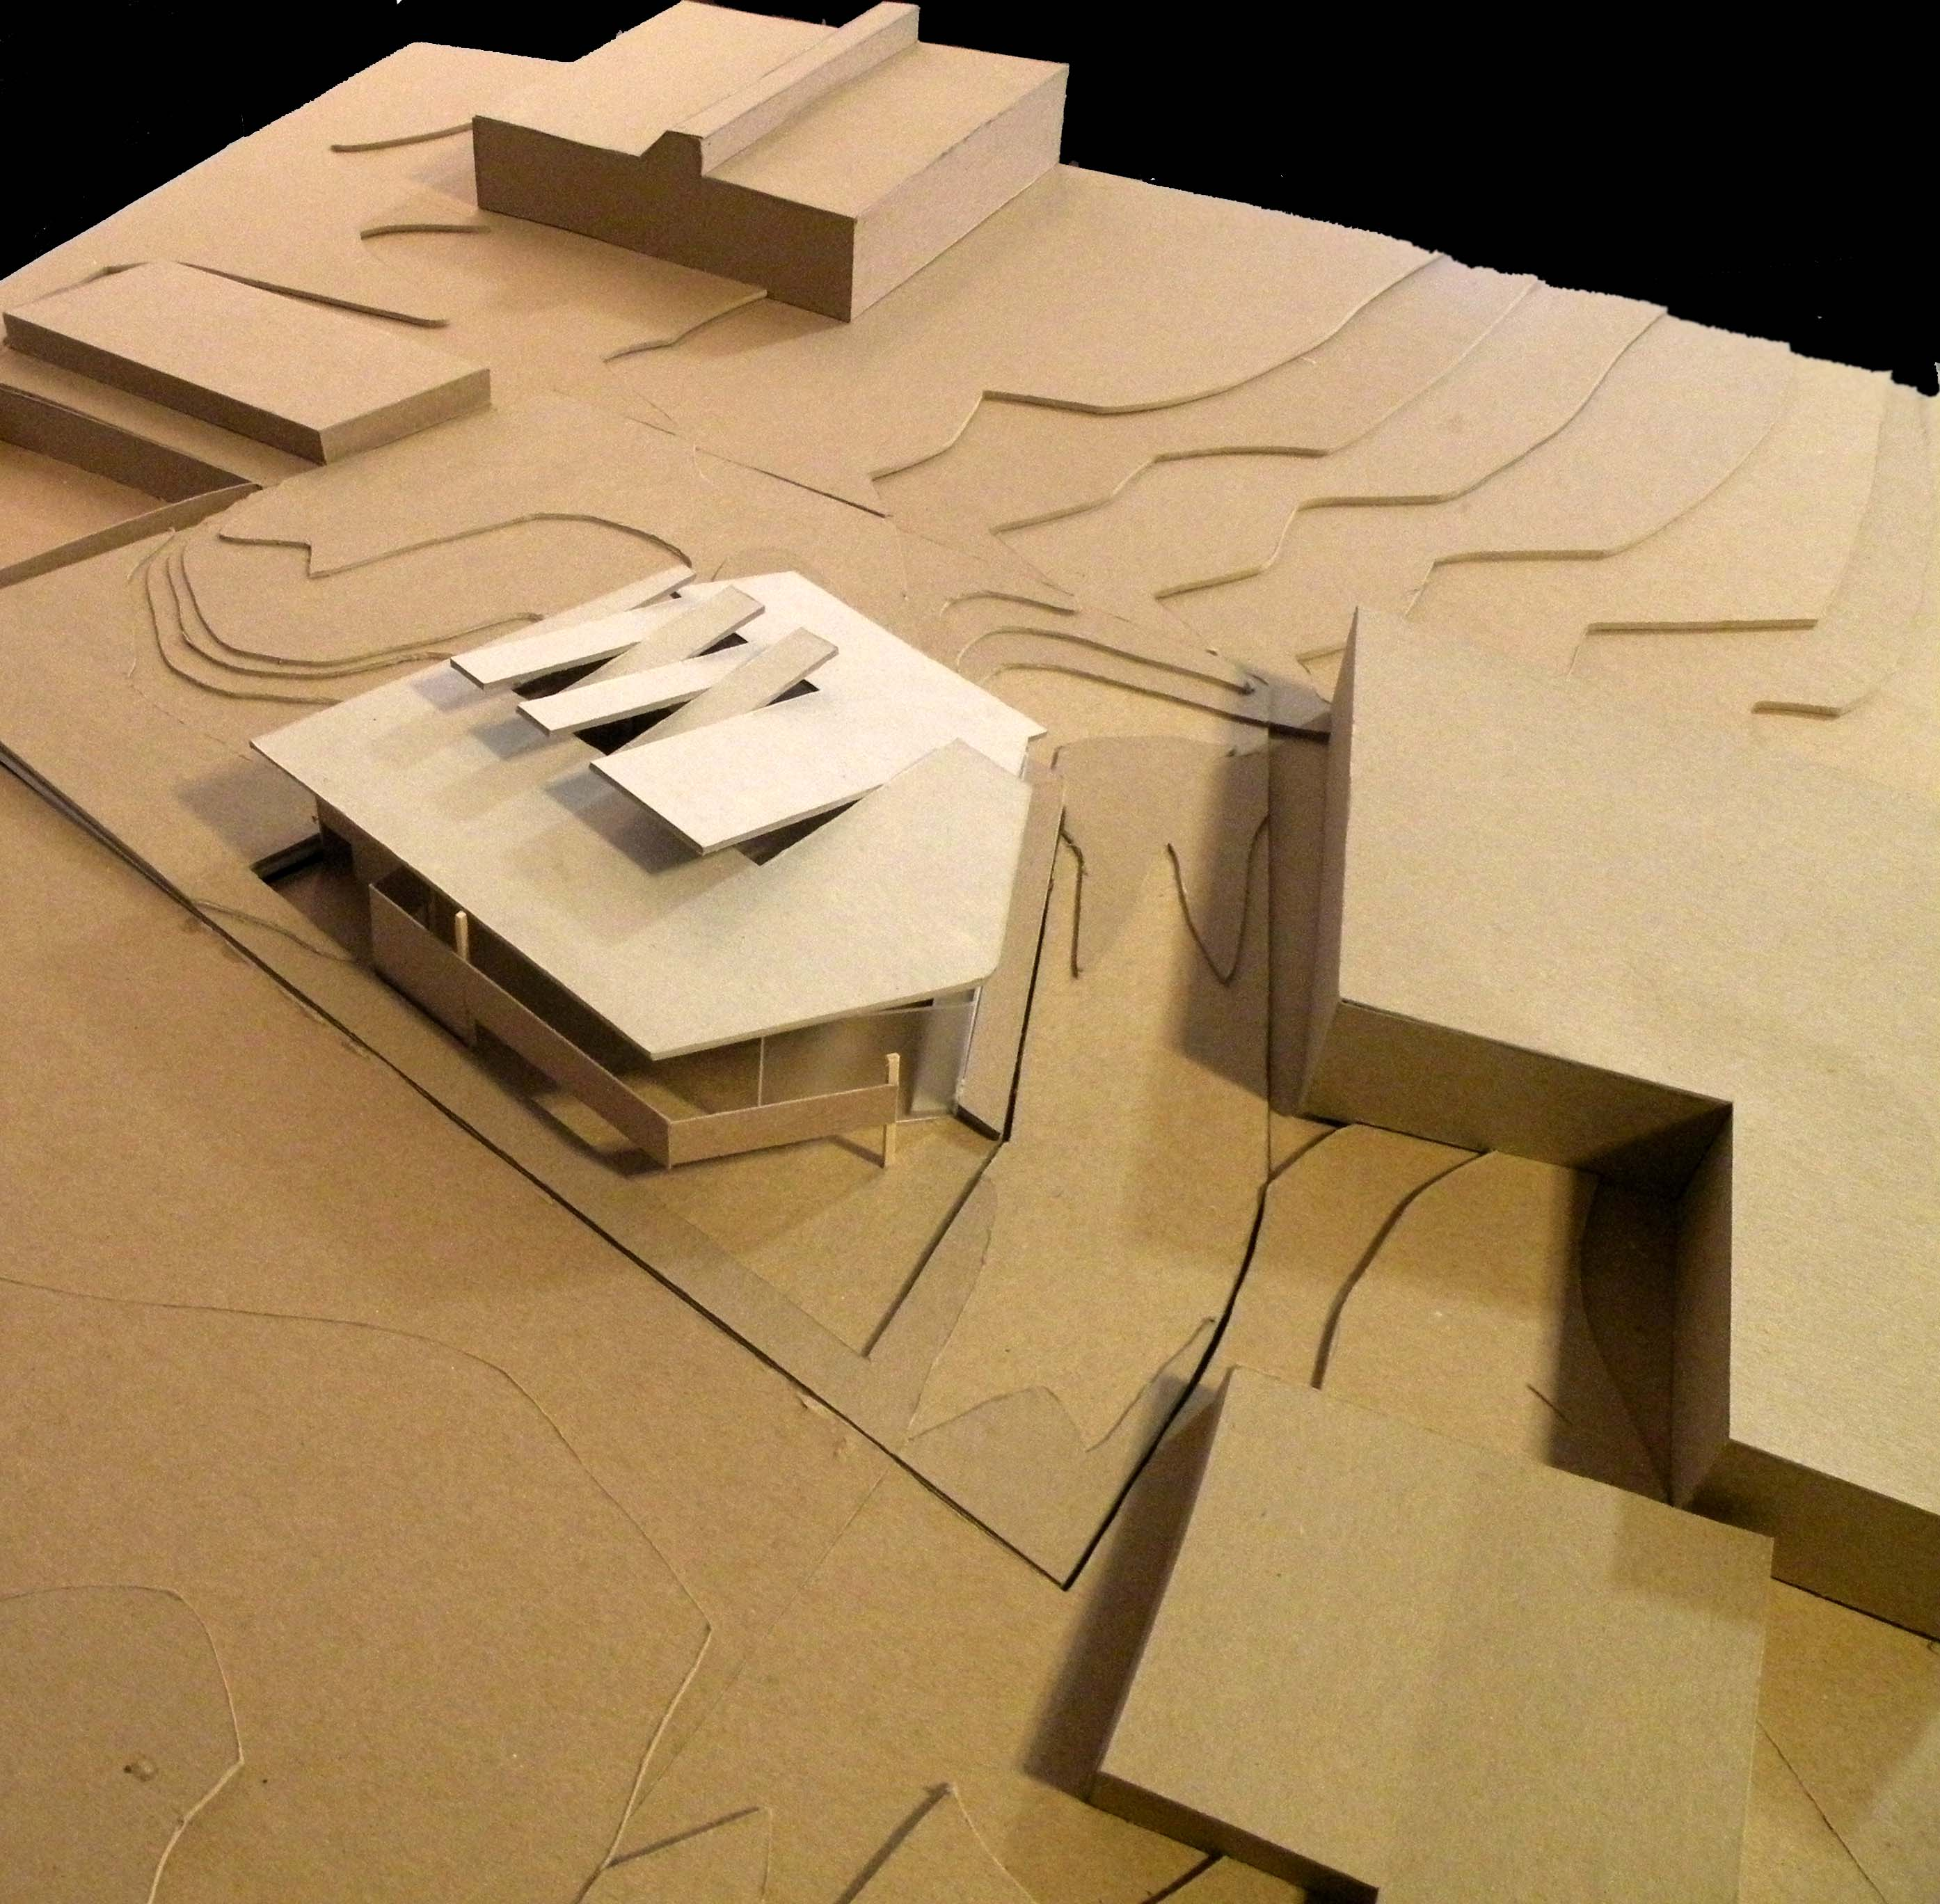 Building Model in Site